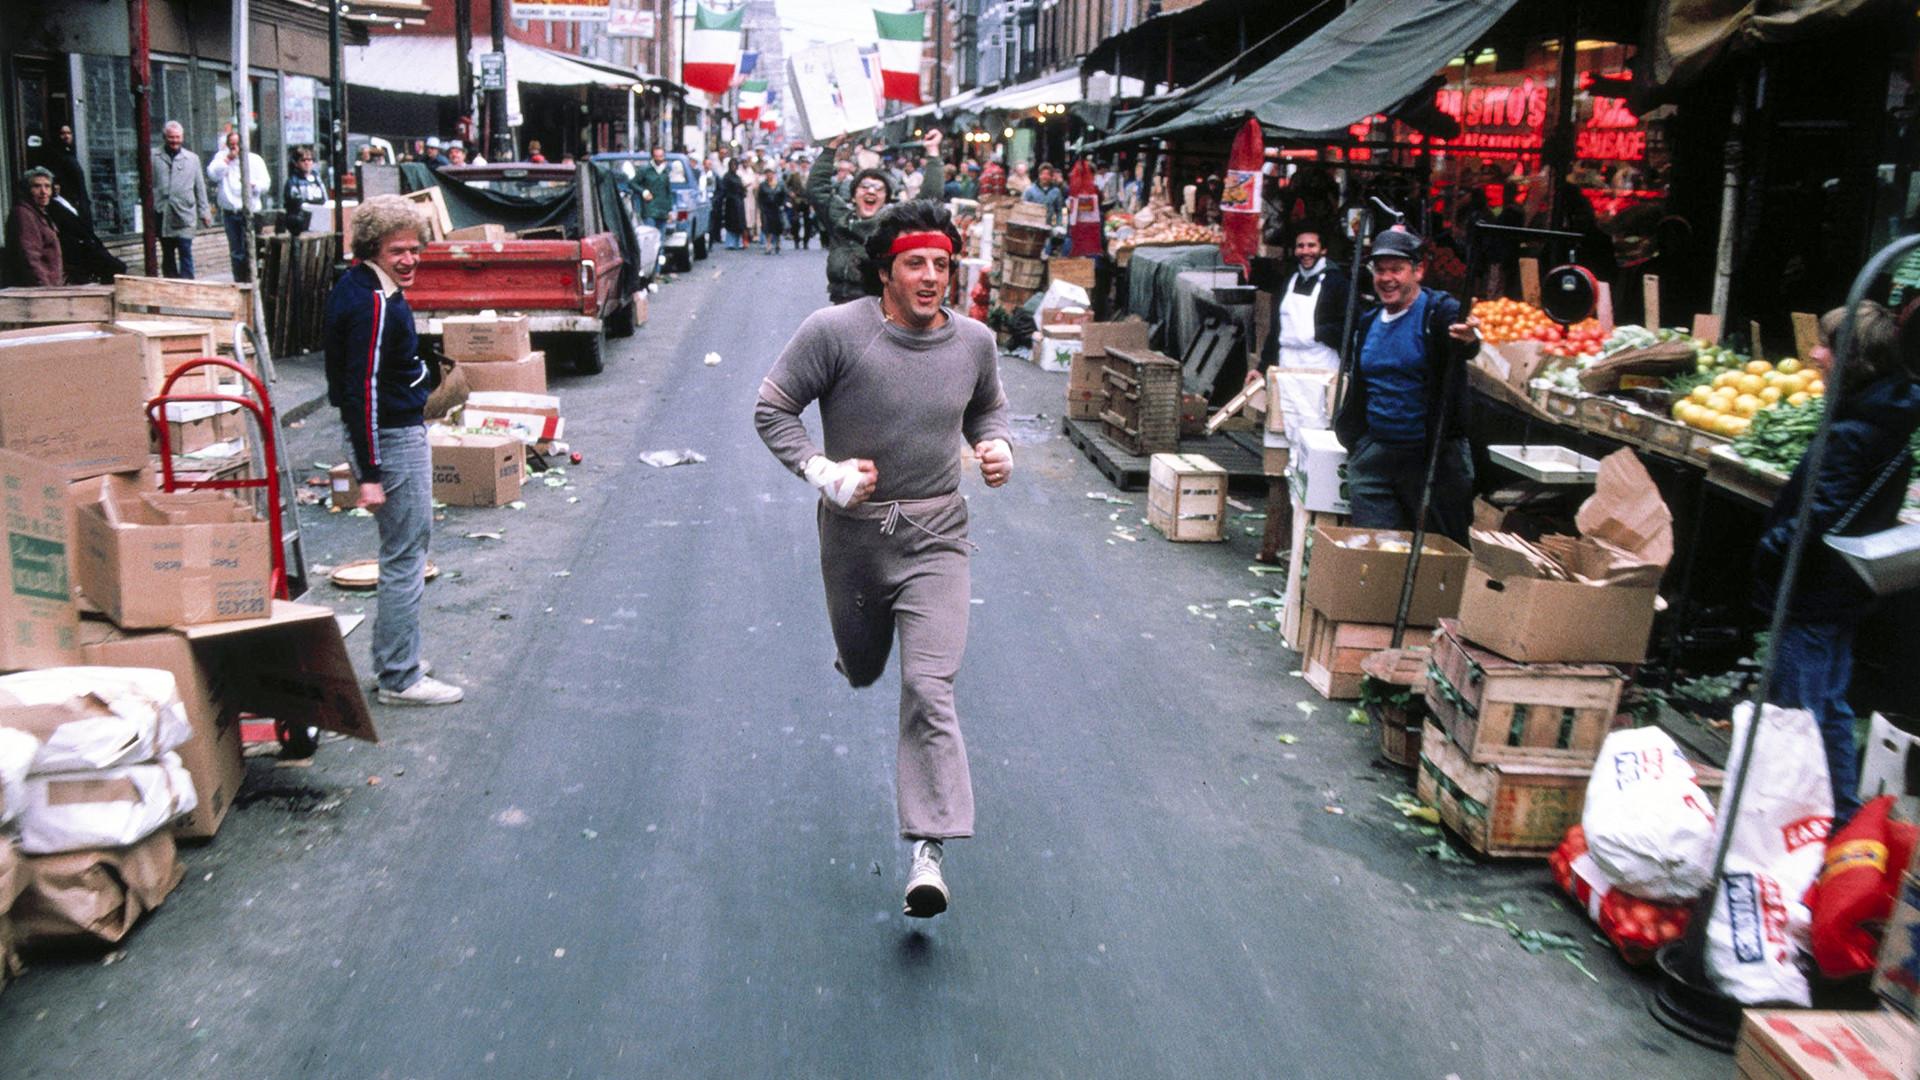 Rocky Balboa in Rocky II sporting a Russell Athletic sweatshirt